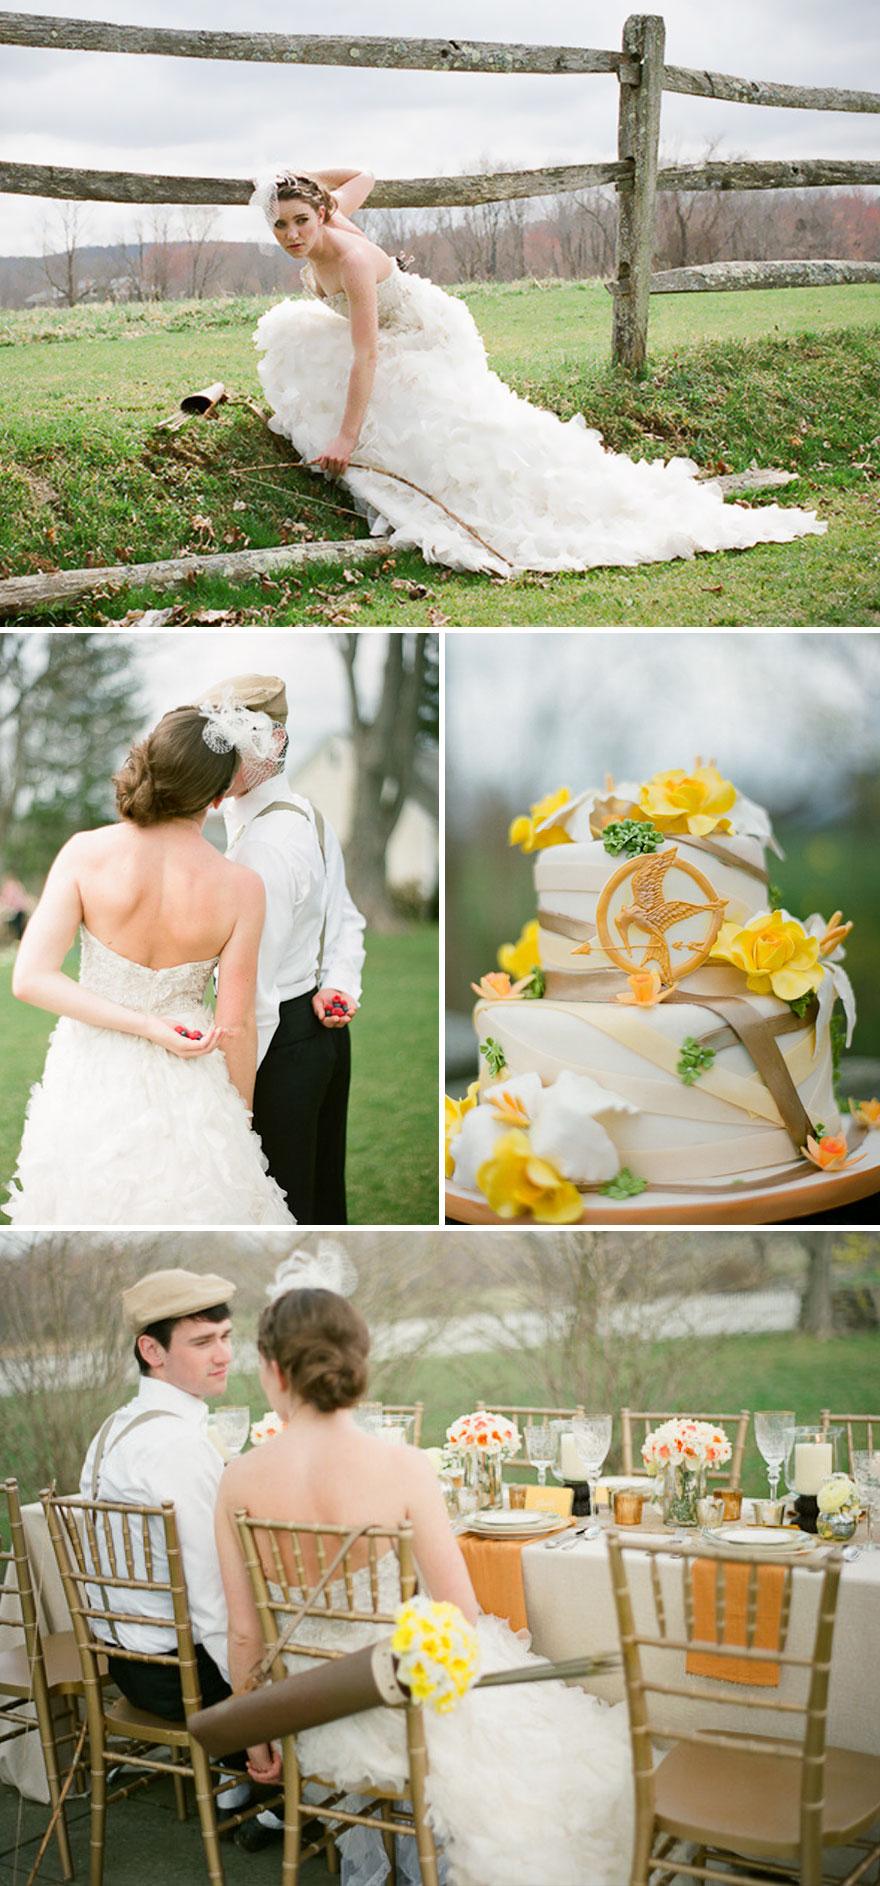 Hunger Games Themed Wedding